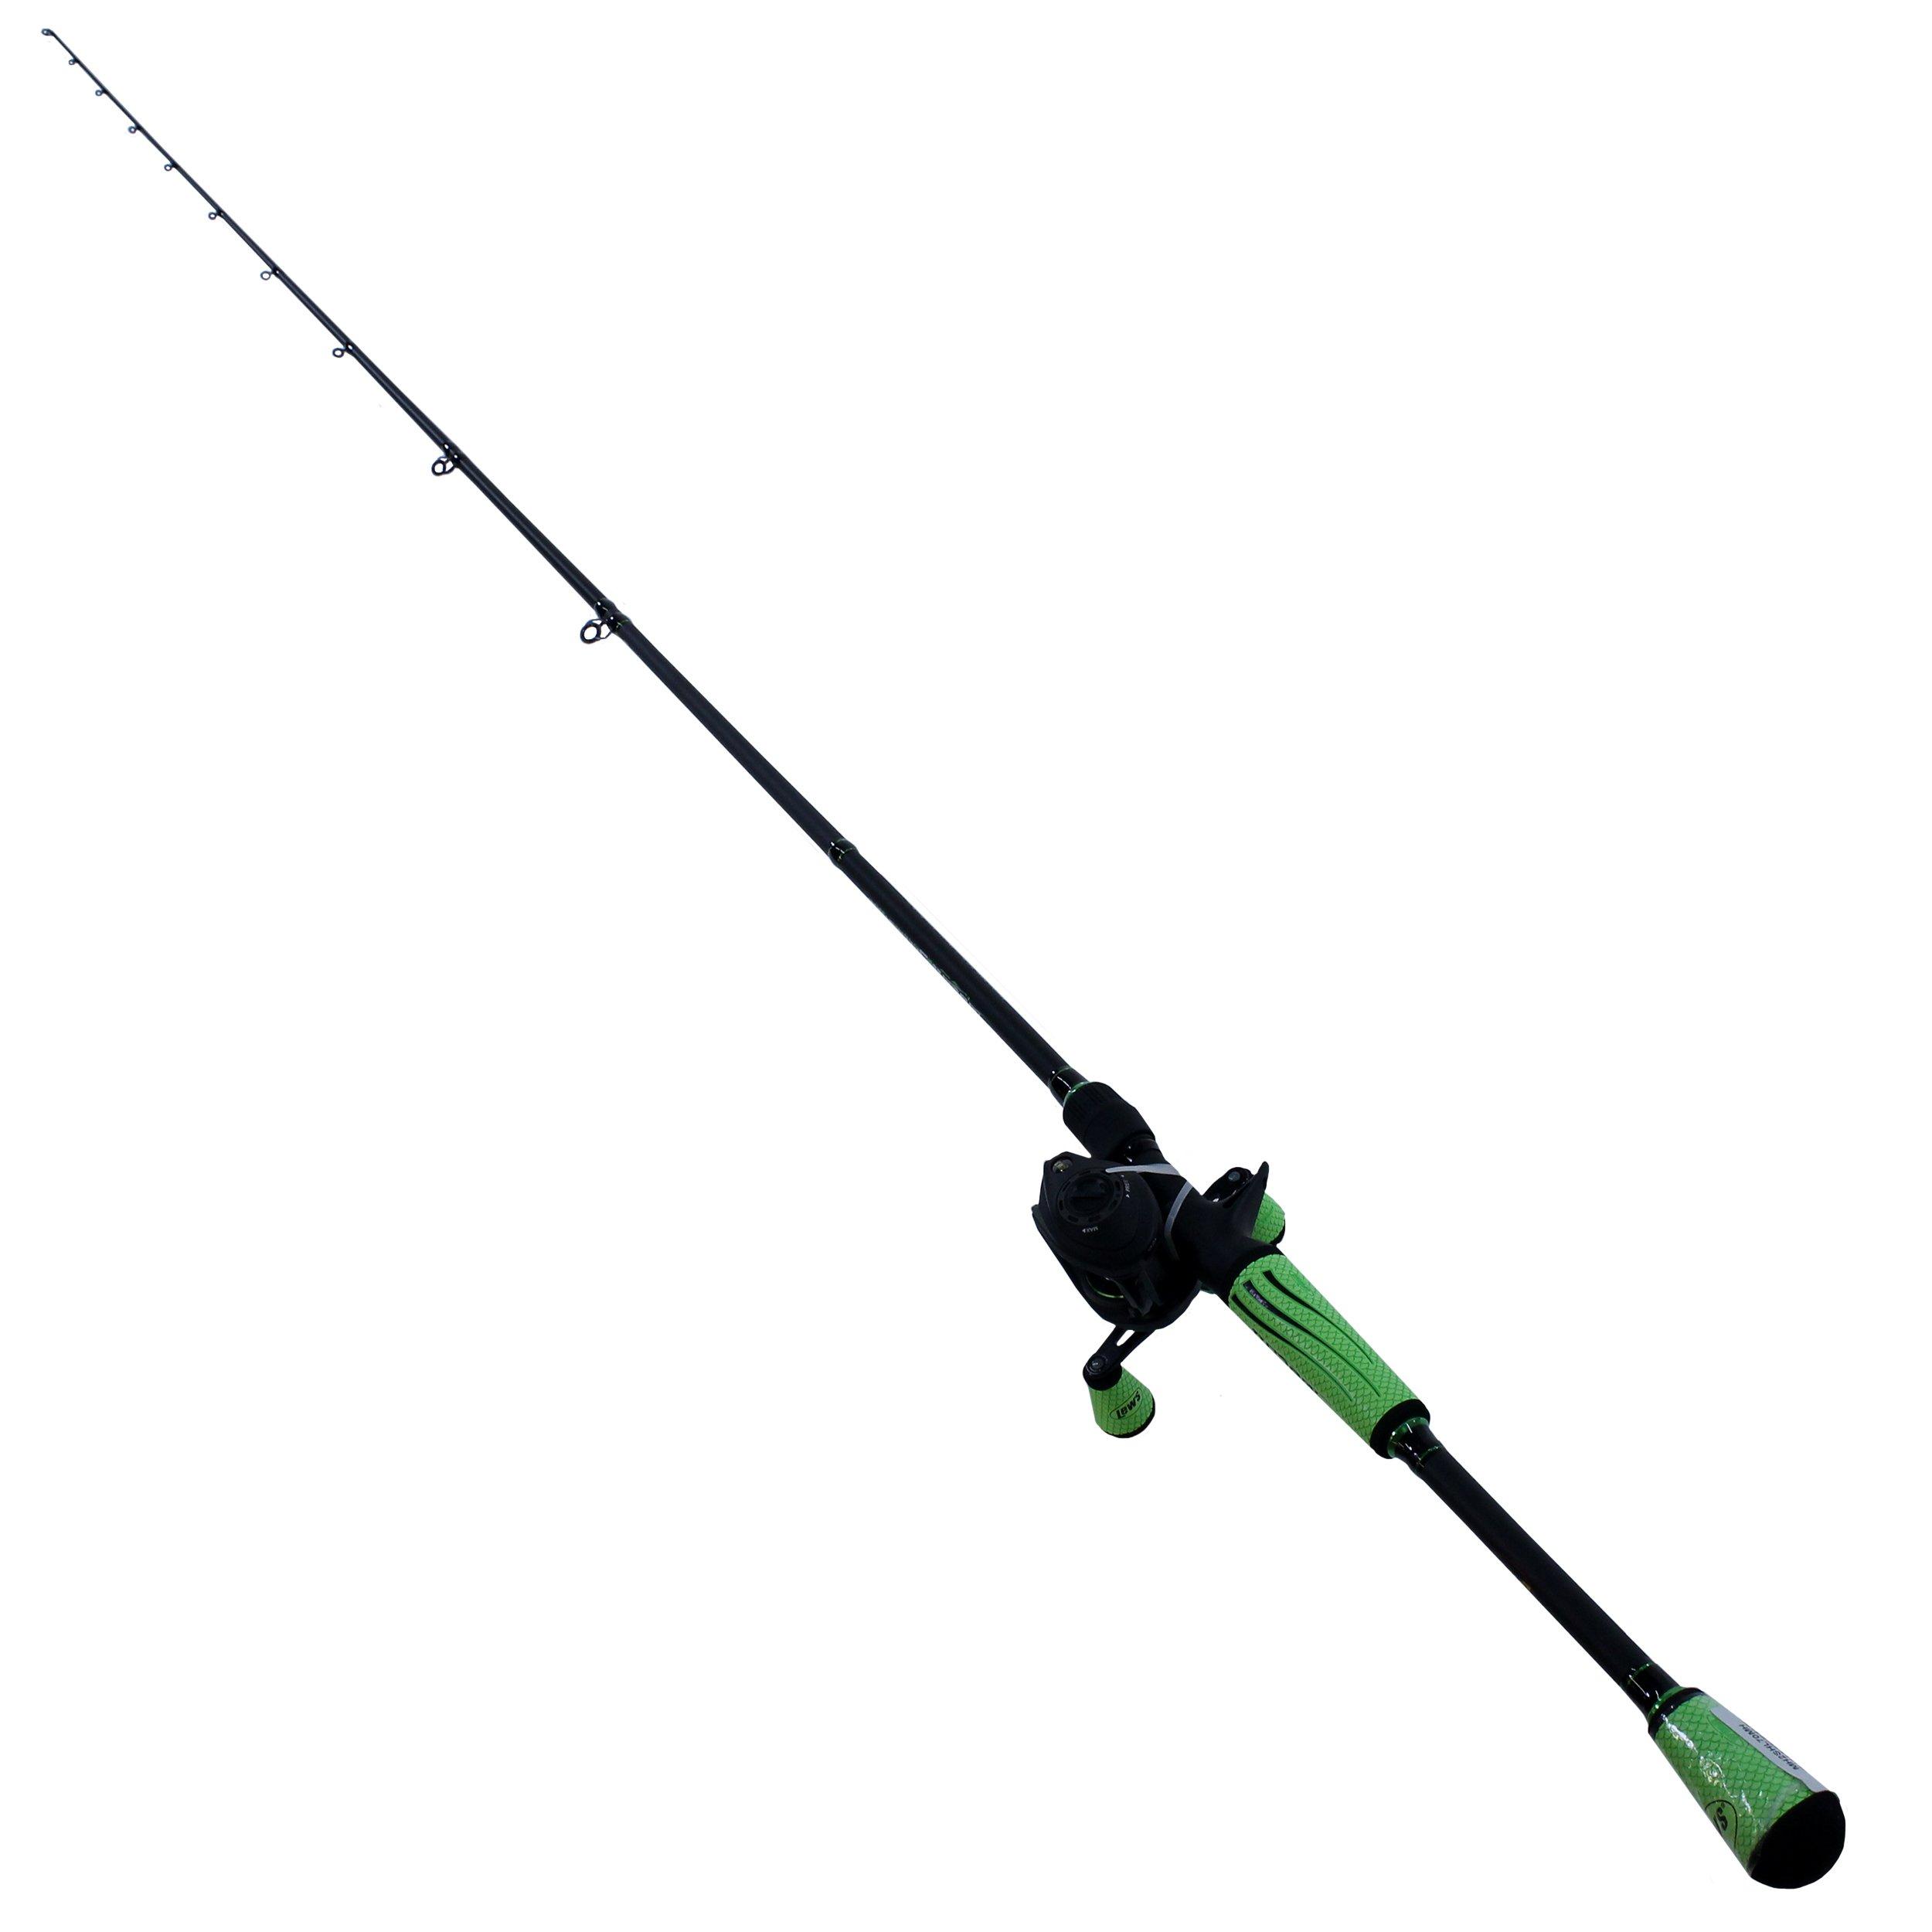 Lew's Fishing MH2SHL70MH Lews Fishing, Mach Ii Baitcast Combo, 7.5: 1 Gear Ratio, 7' Length, 1pc Rod, Medium/Heavy Power, Left Hand by Lew's Fishing